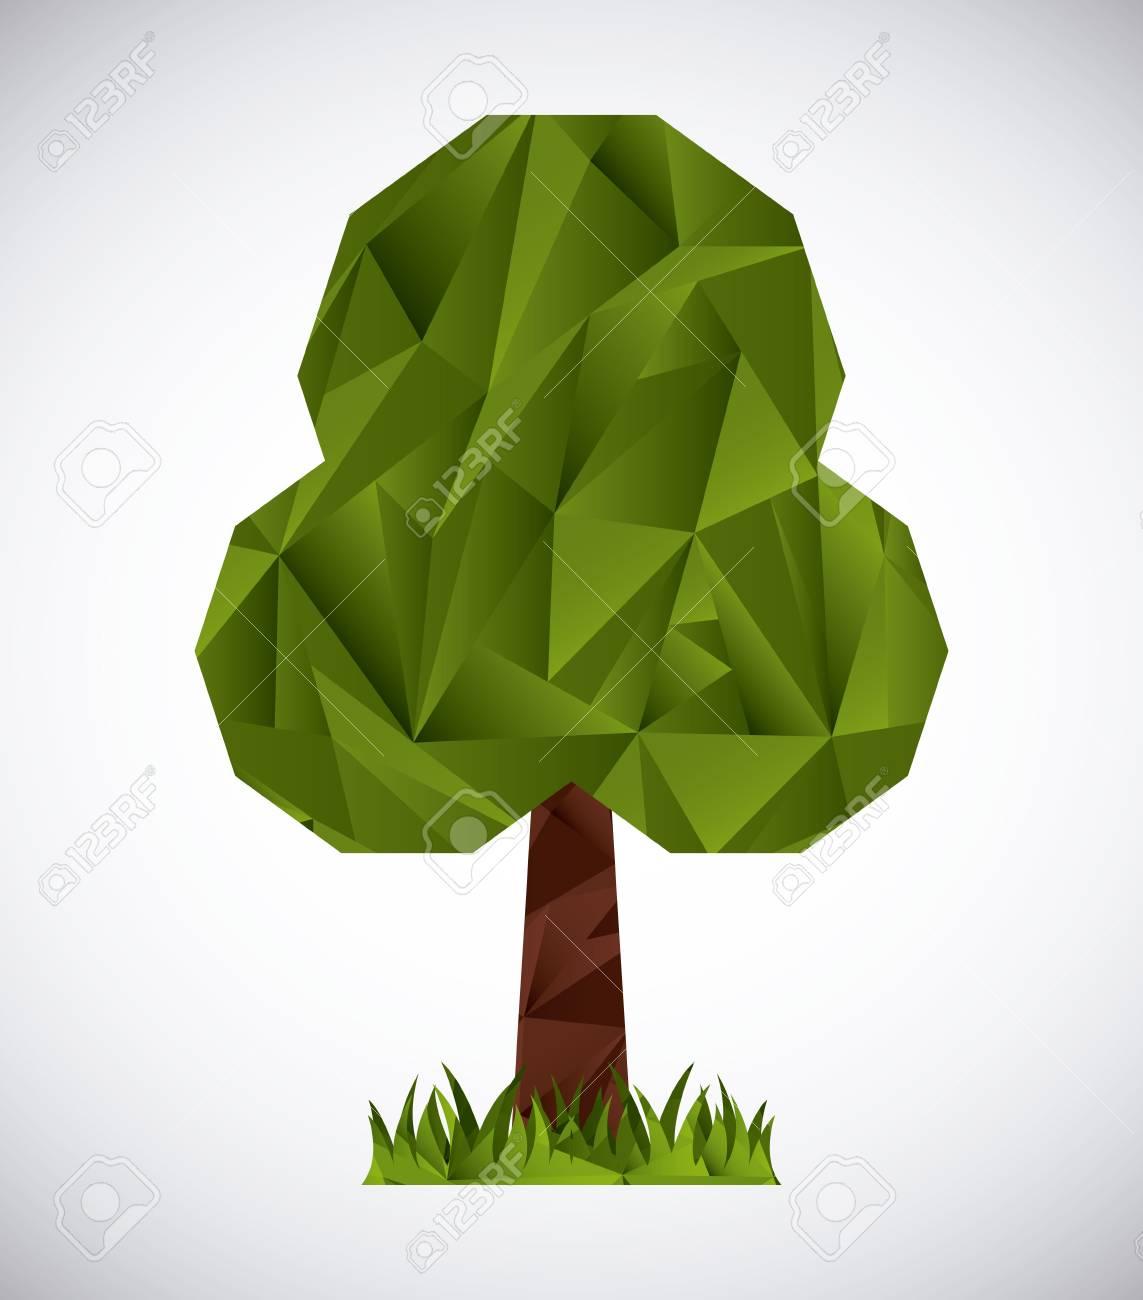 Trees Origami Design Vector Illustration Stock